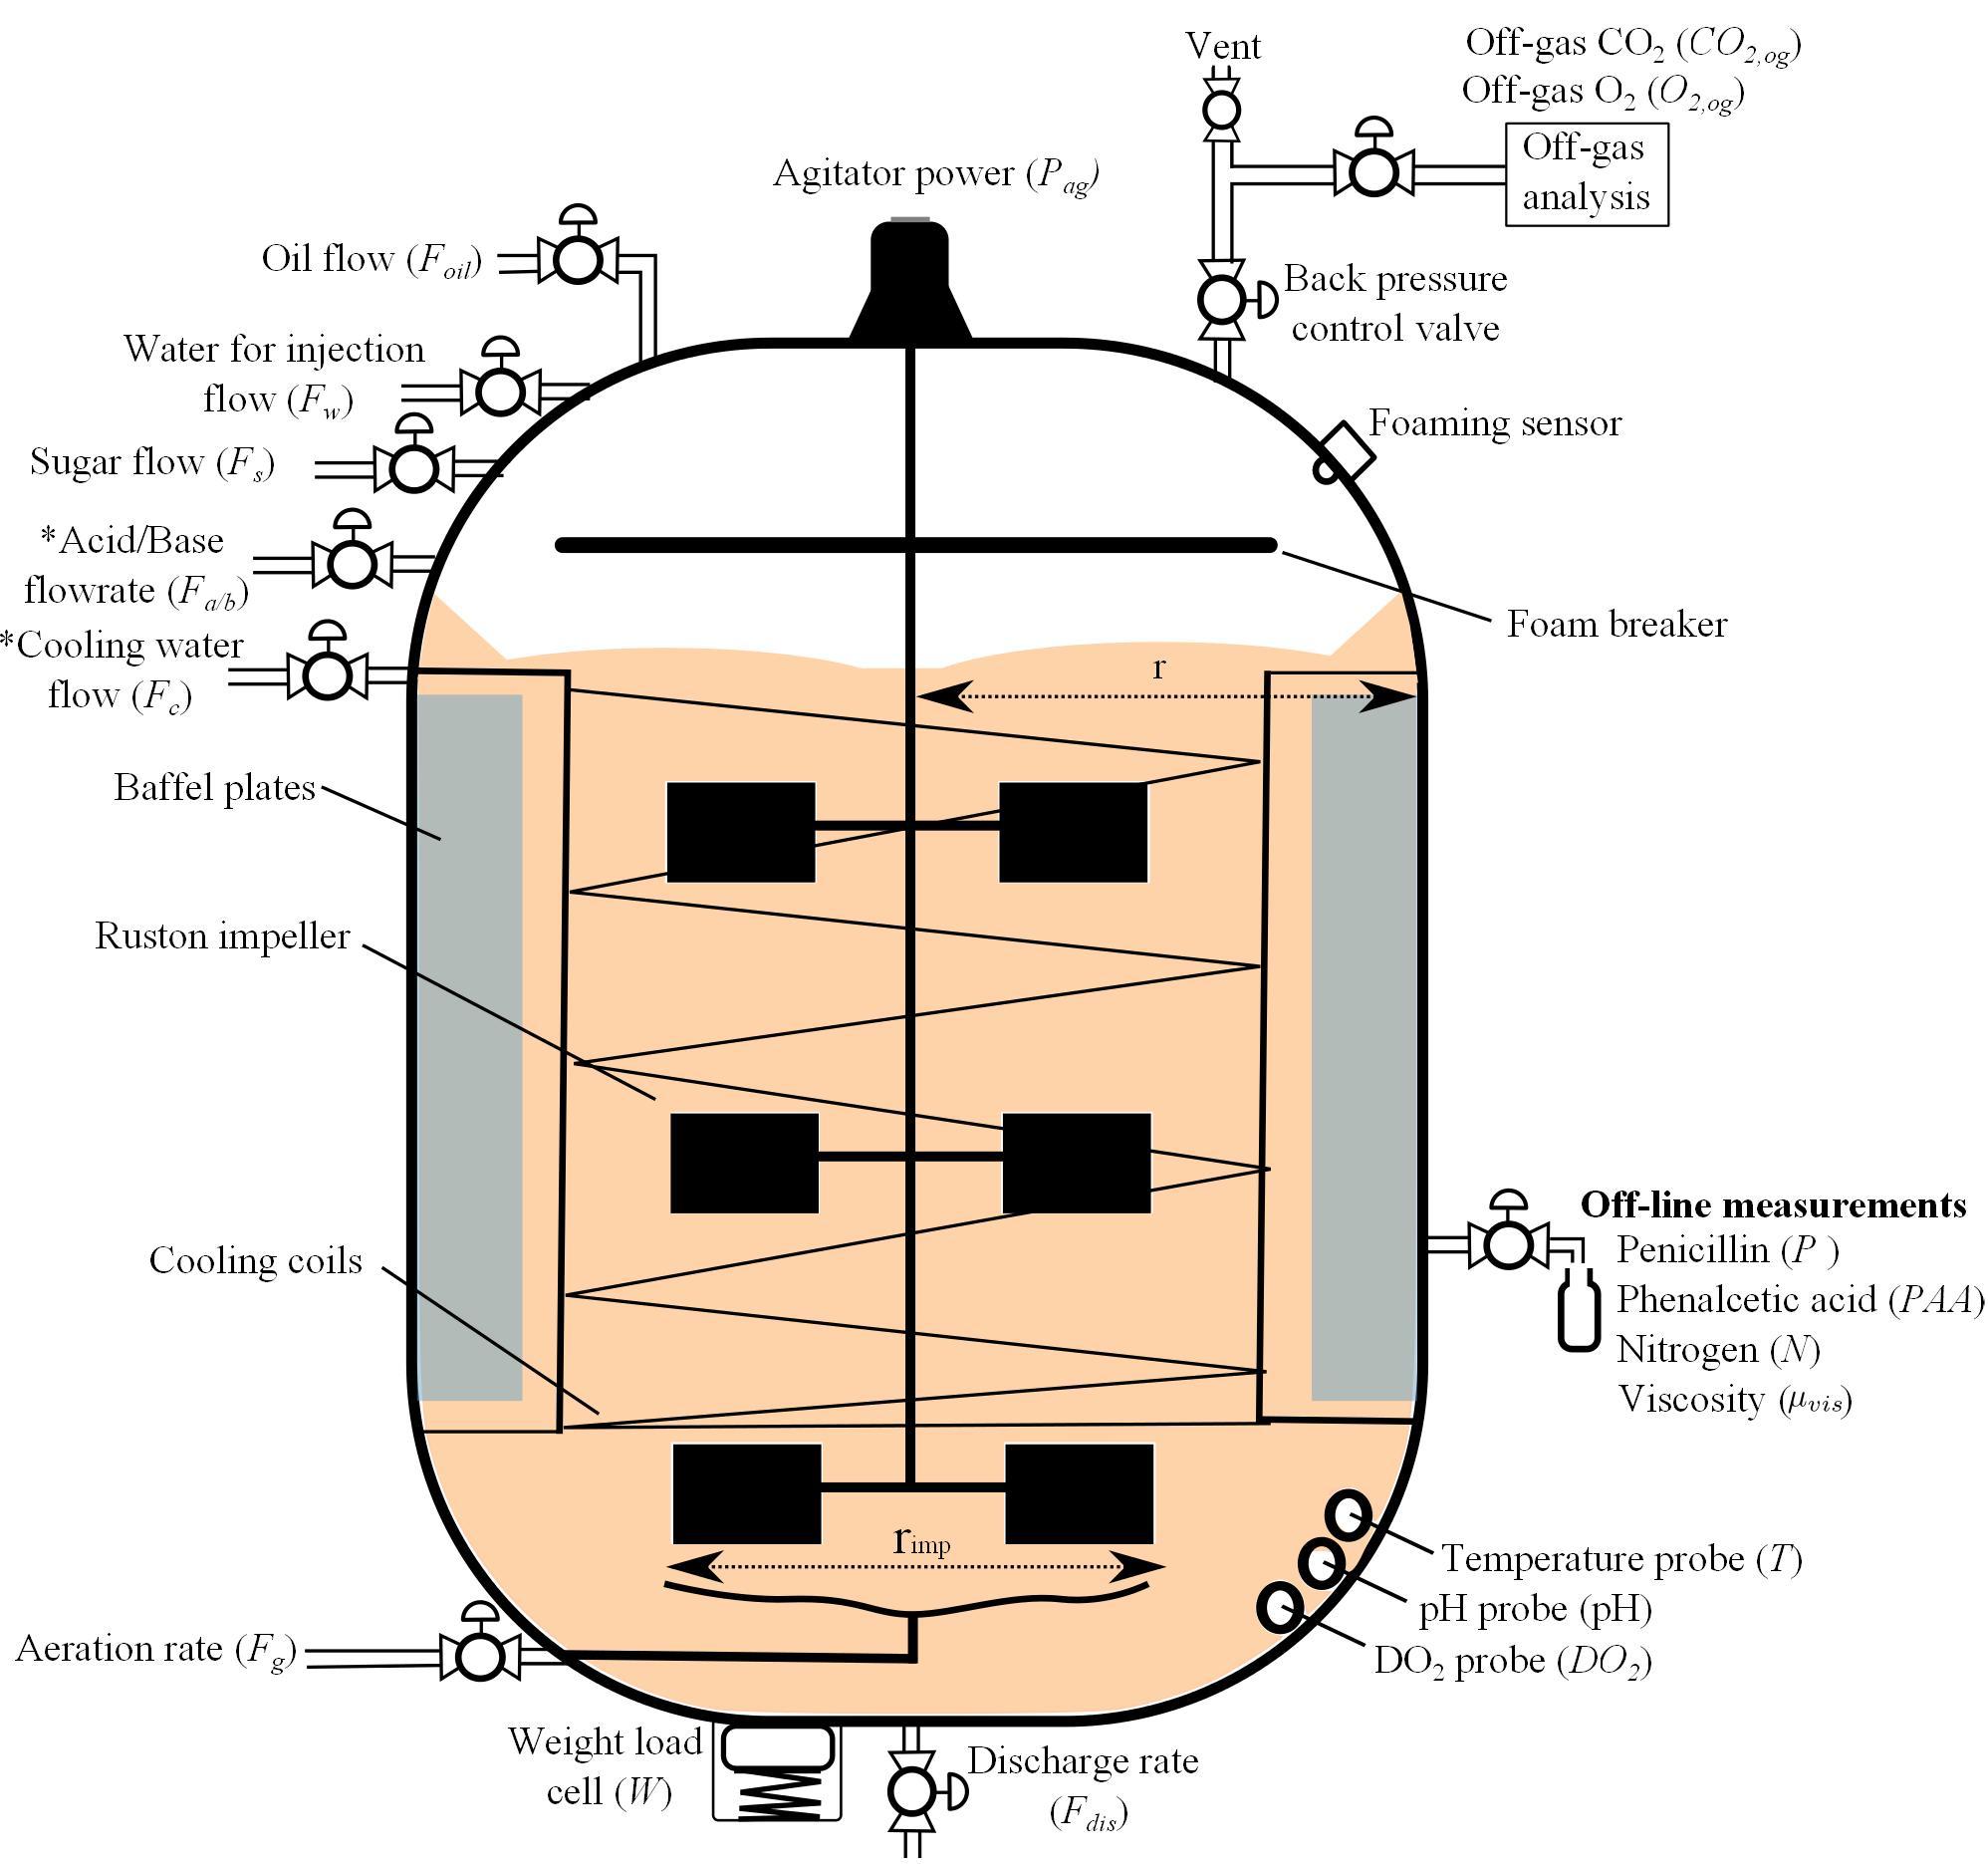 Industrial-scale Penicillin SimulationV2 - File Exchange - MATLAB